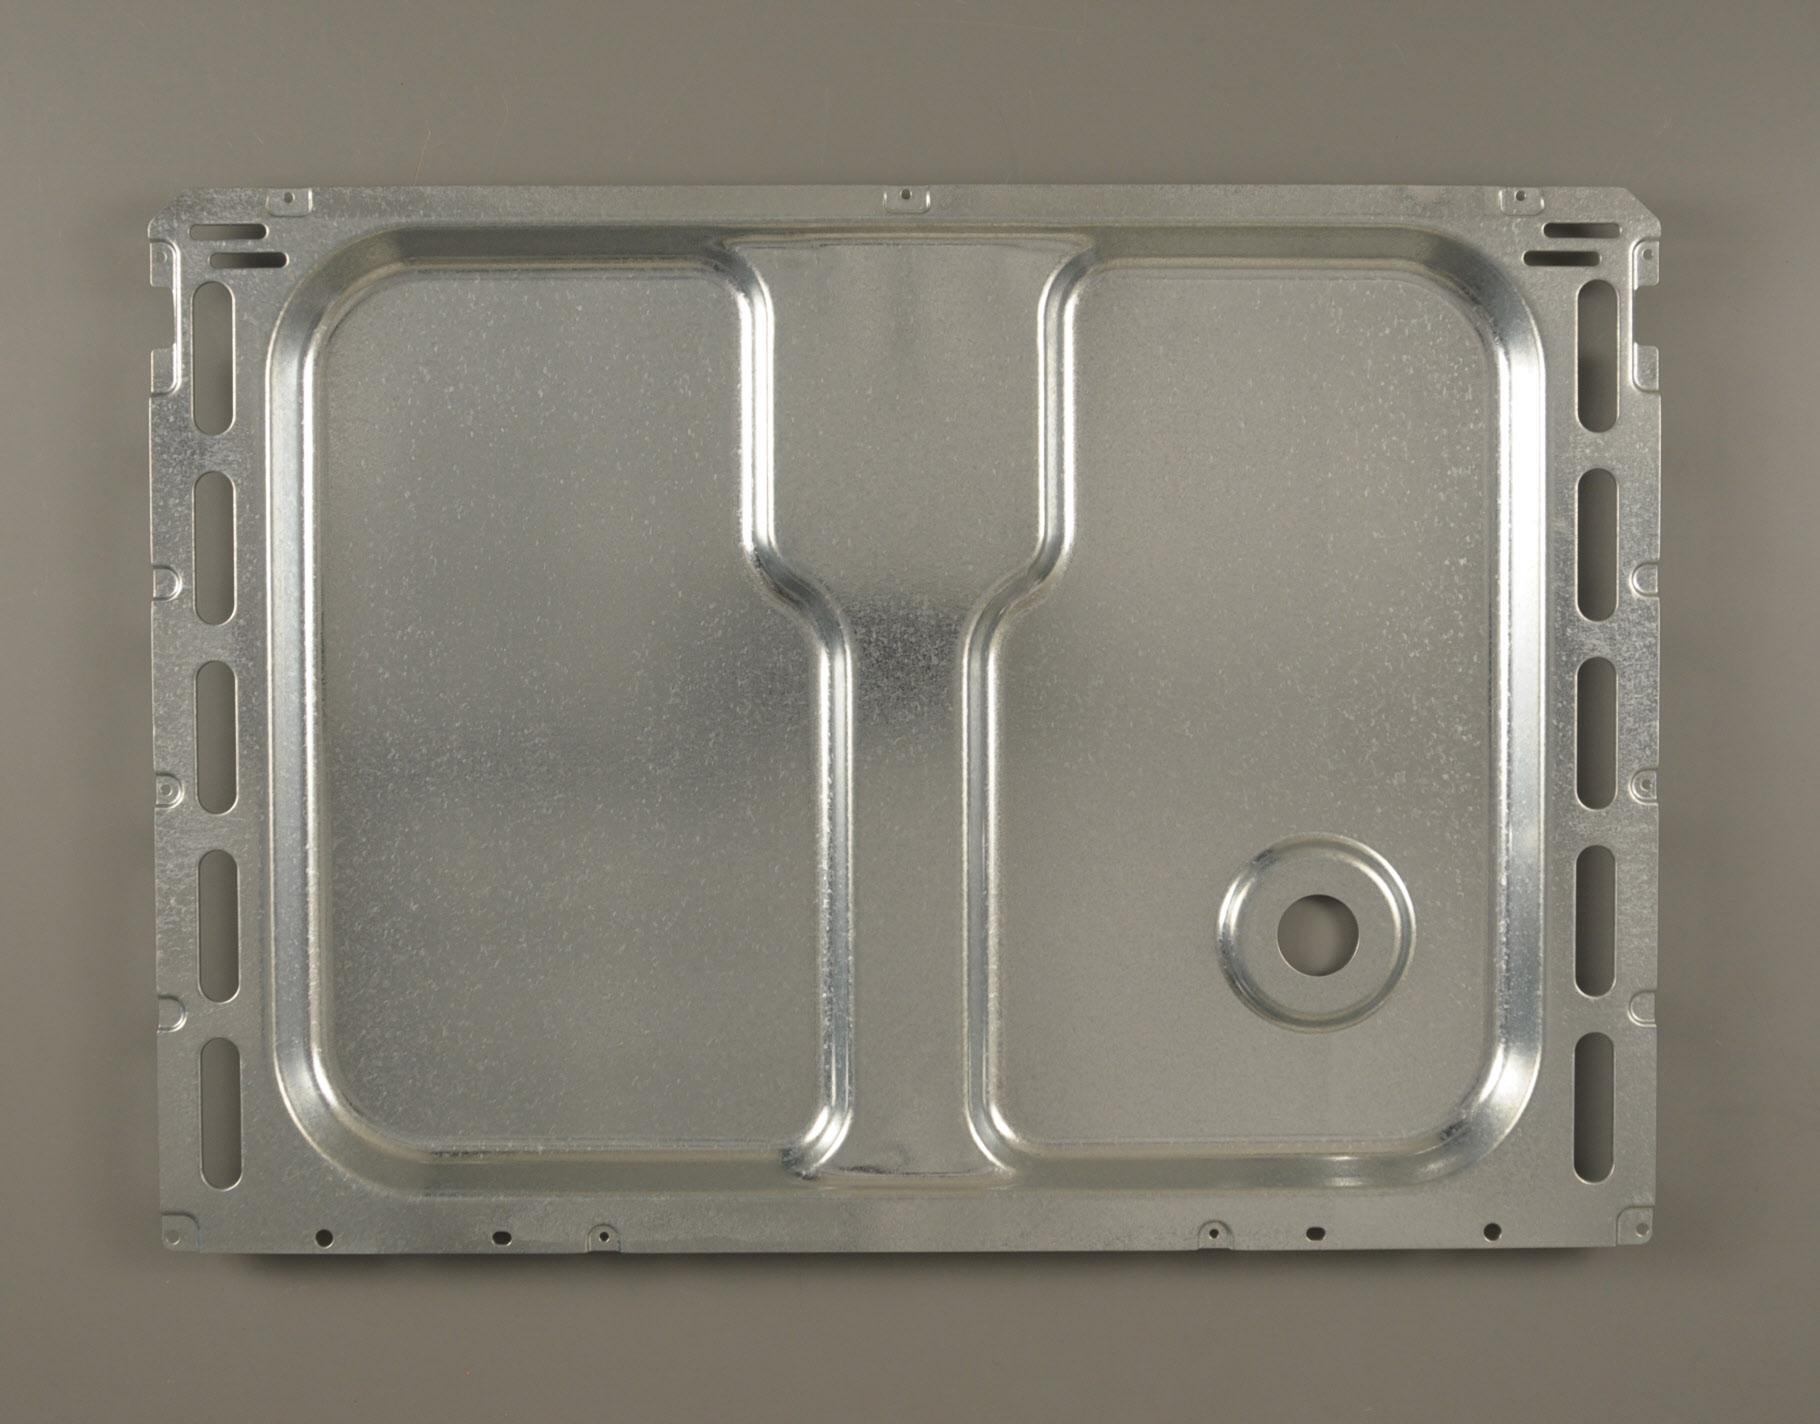 Estate Range/Stove/Oven Part # WPW10209613 - Bottom Panel